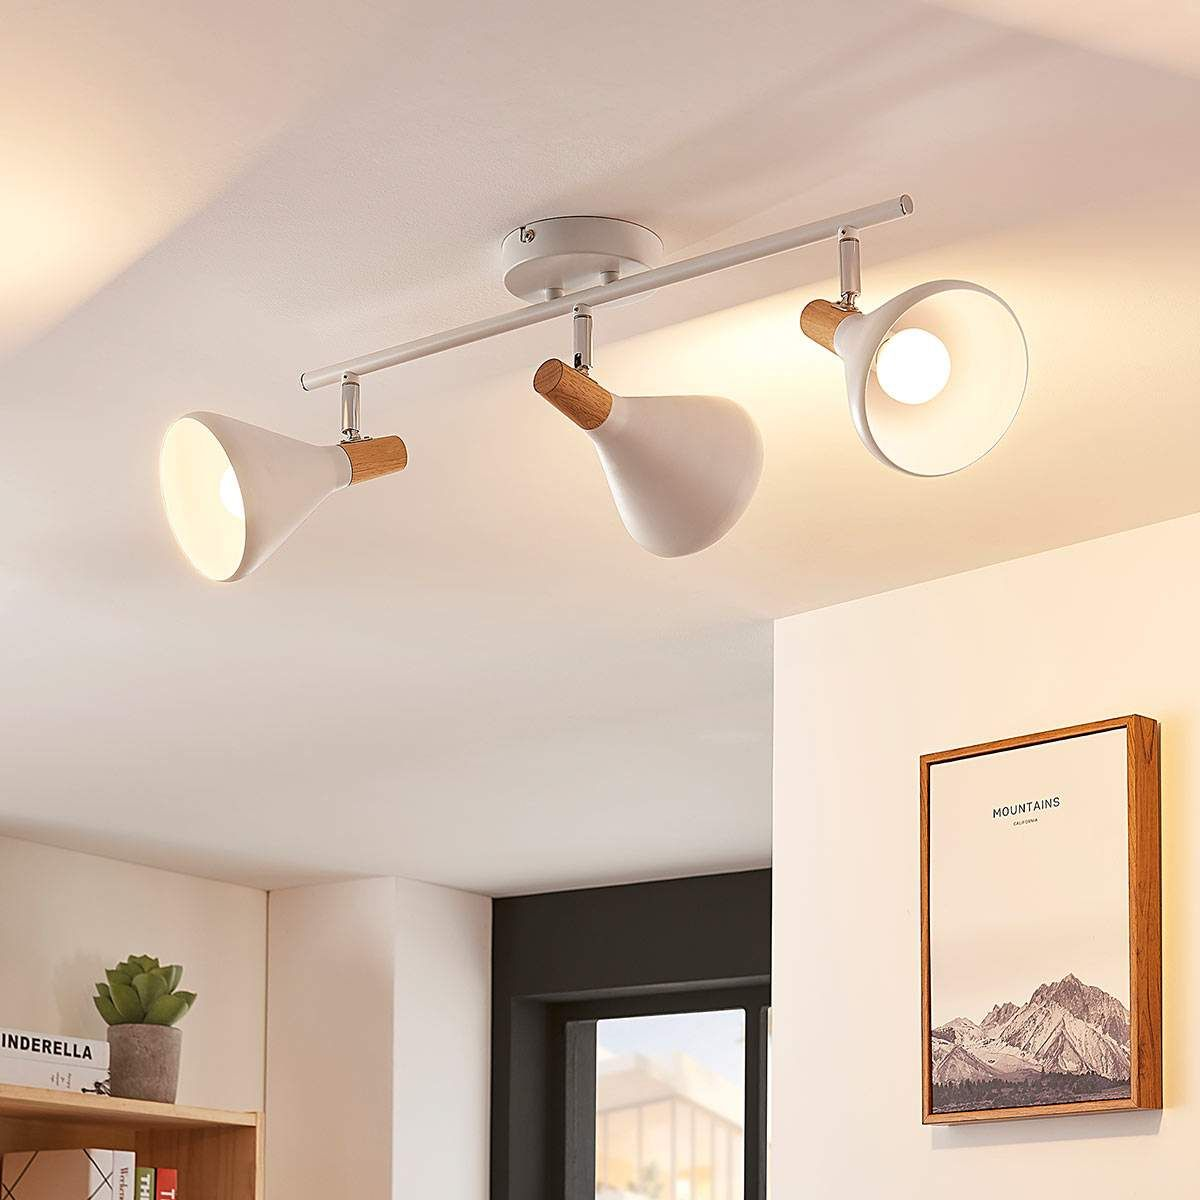 LED Wandleuchte Arina Strahler Spot Lampenwelt Metall Weiß Holz Deckenleuchte